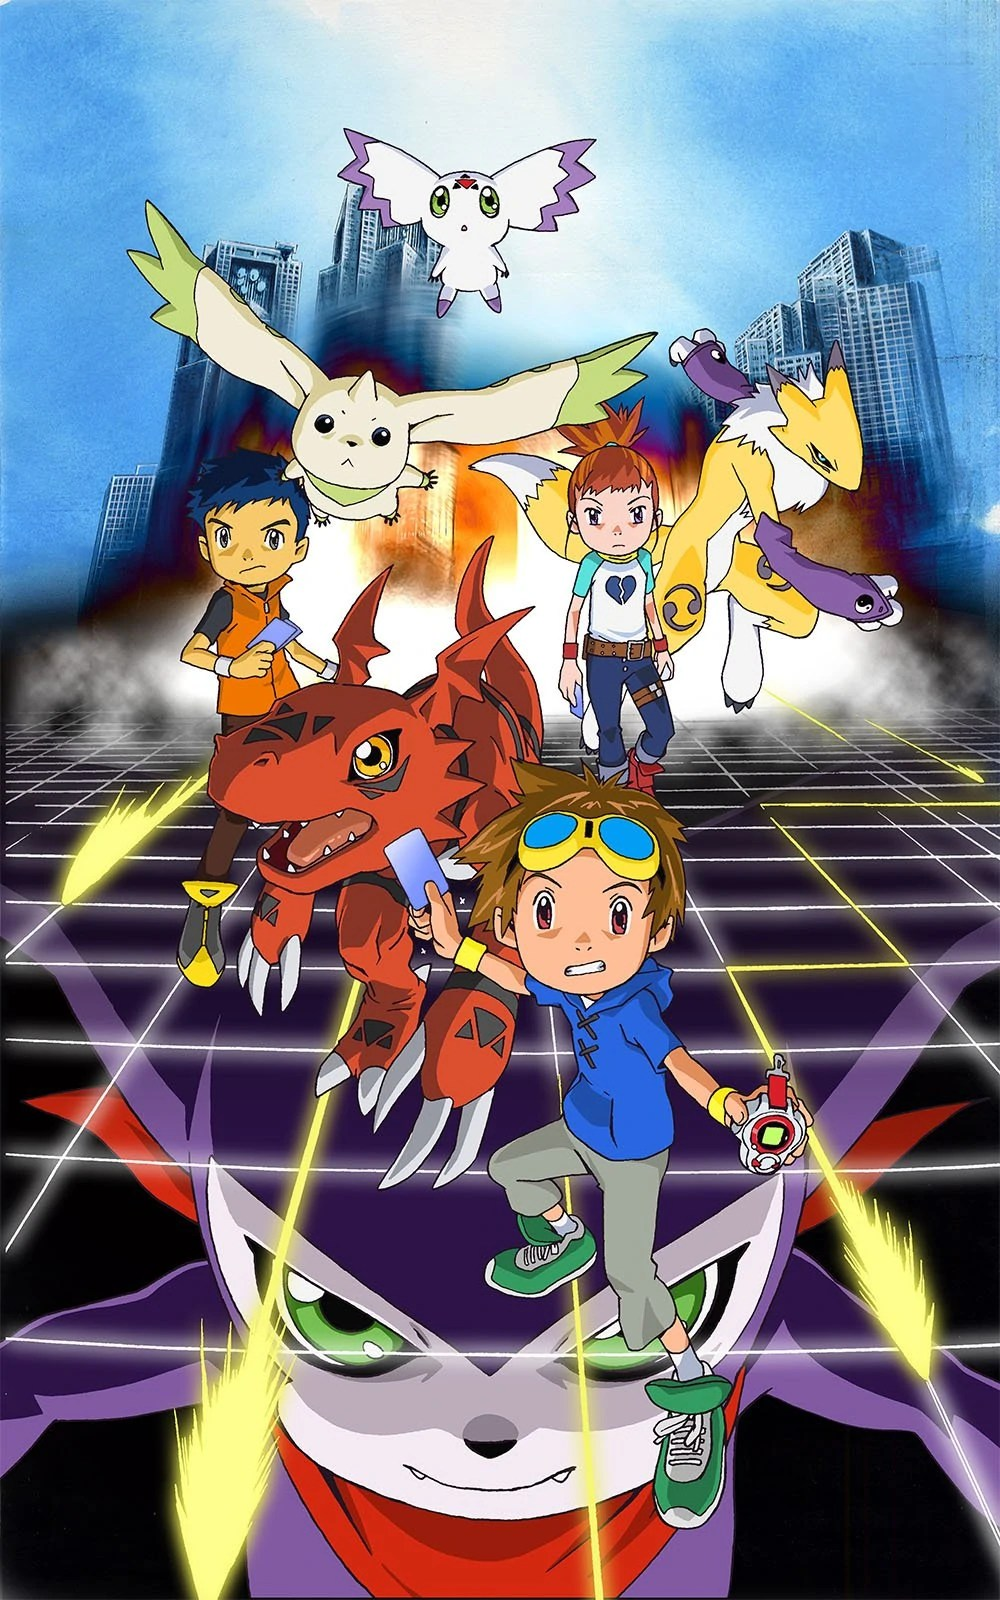 Anime-Planet | Just another WordPress com weblog